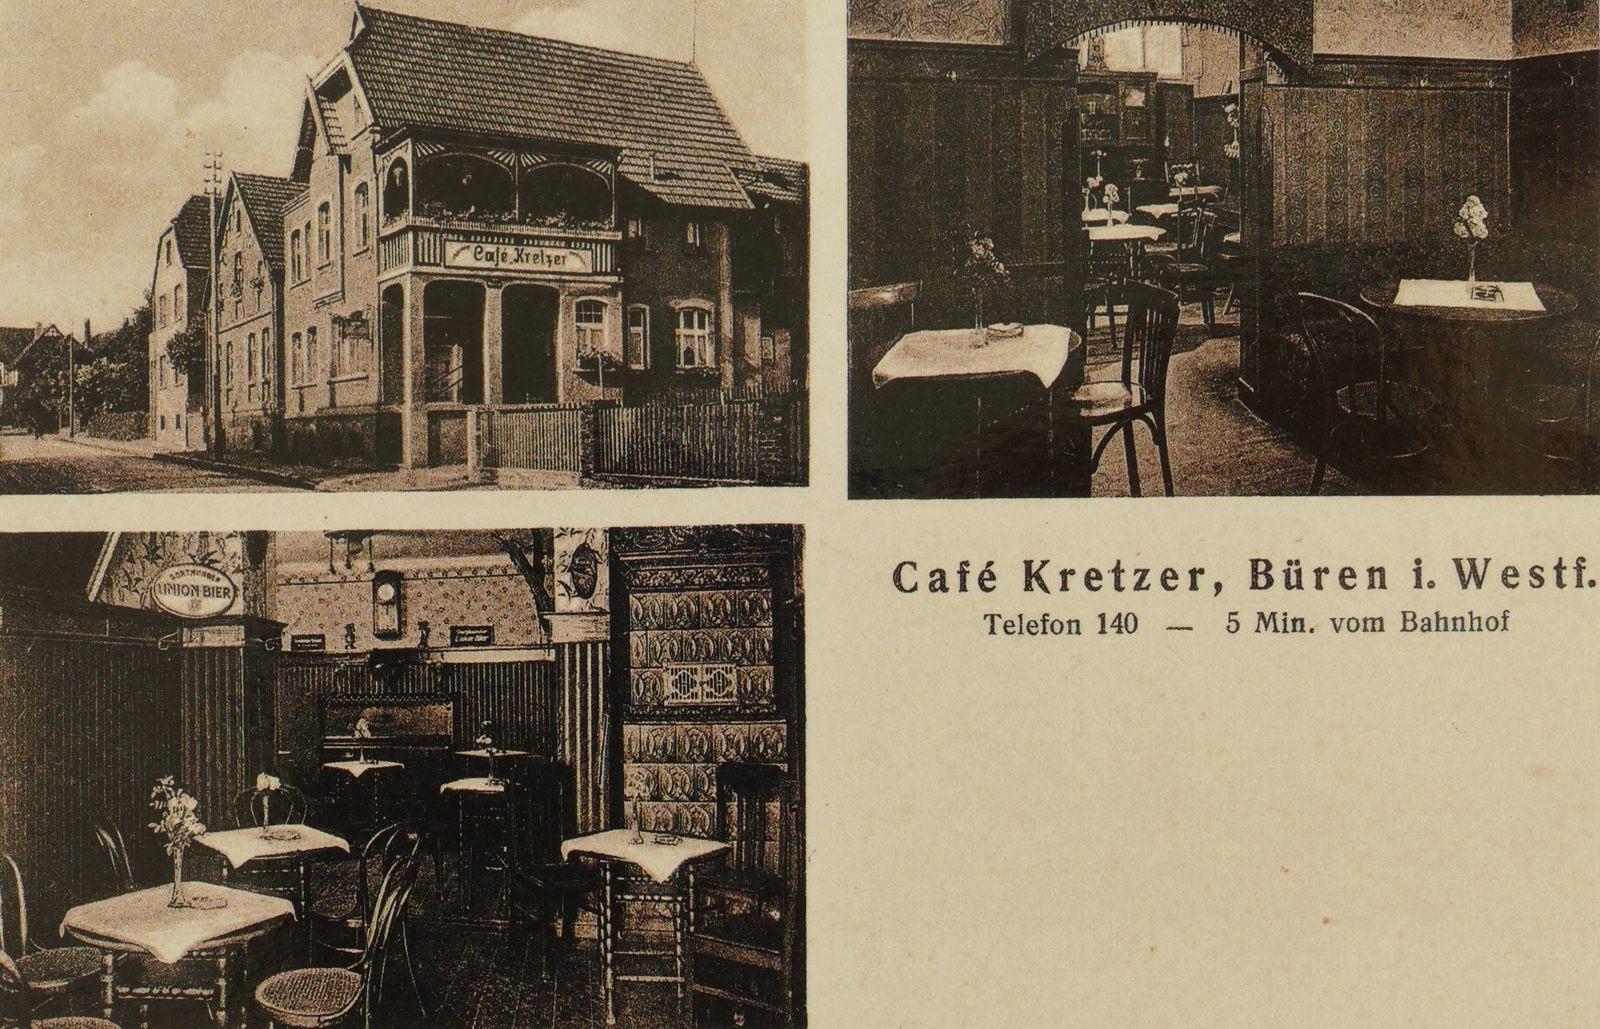 Café Kretzer 1950